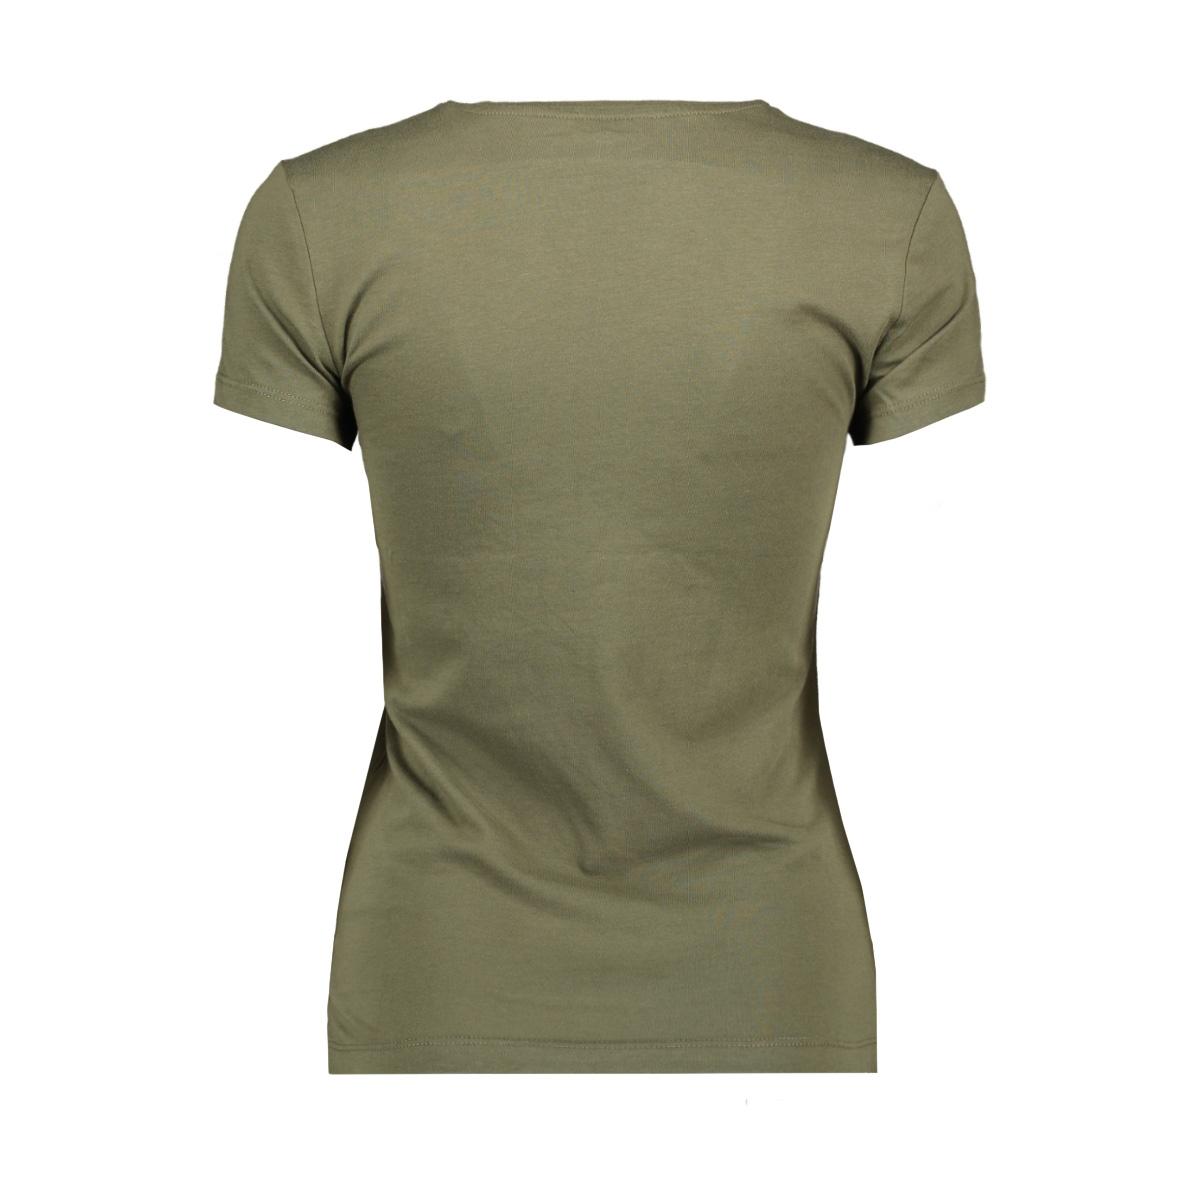 onysofia s/s animal top box jrs 15190531 only t-shirt grape leaf/inspire